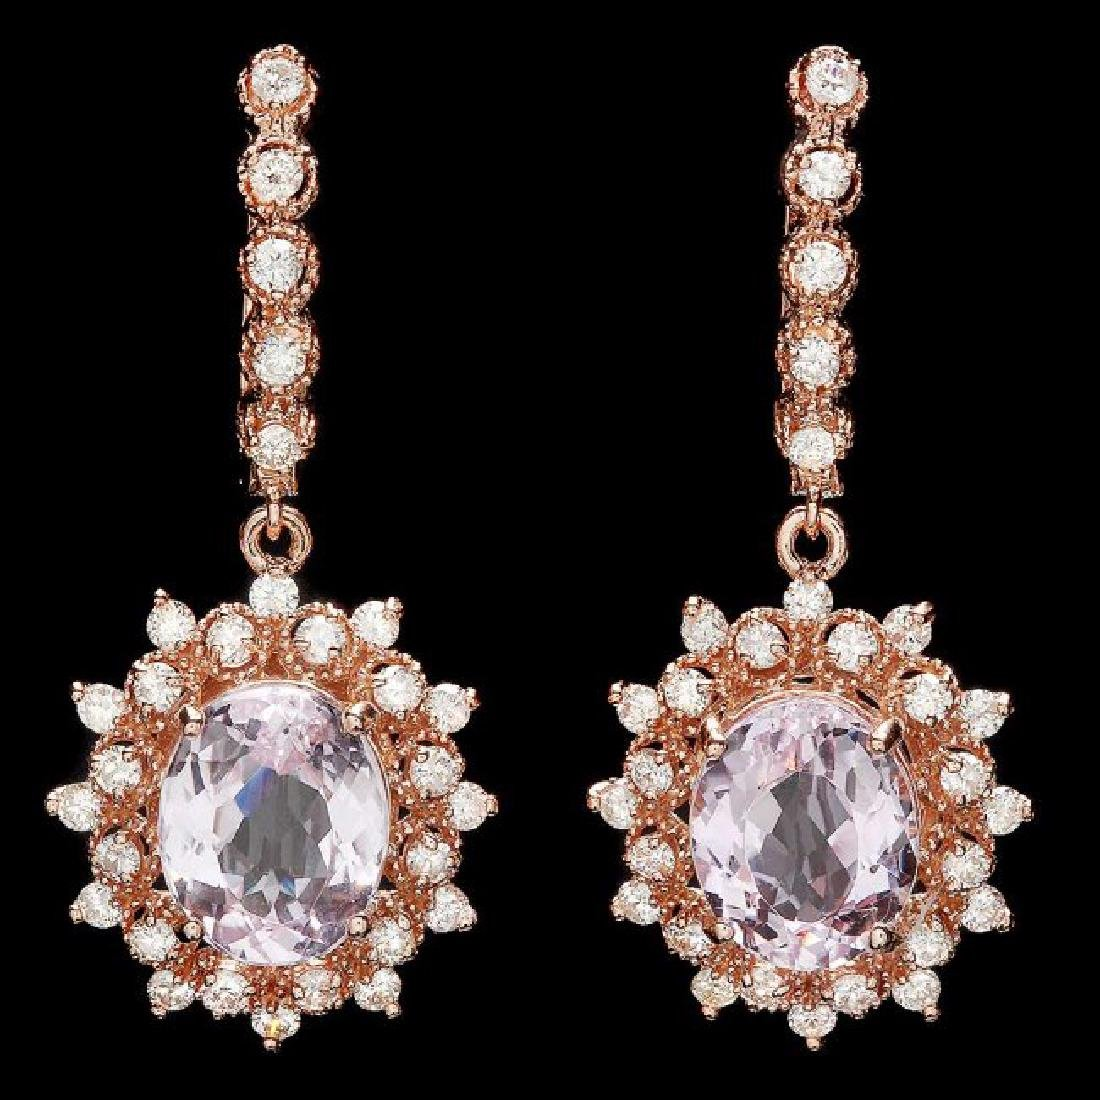 14k Rose 8.00ct Kunzite 1.70ct Diamond Earrings